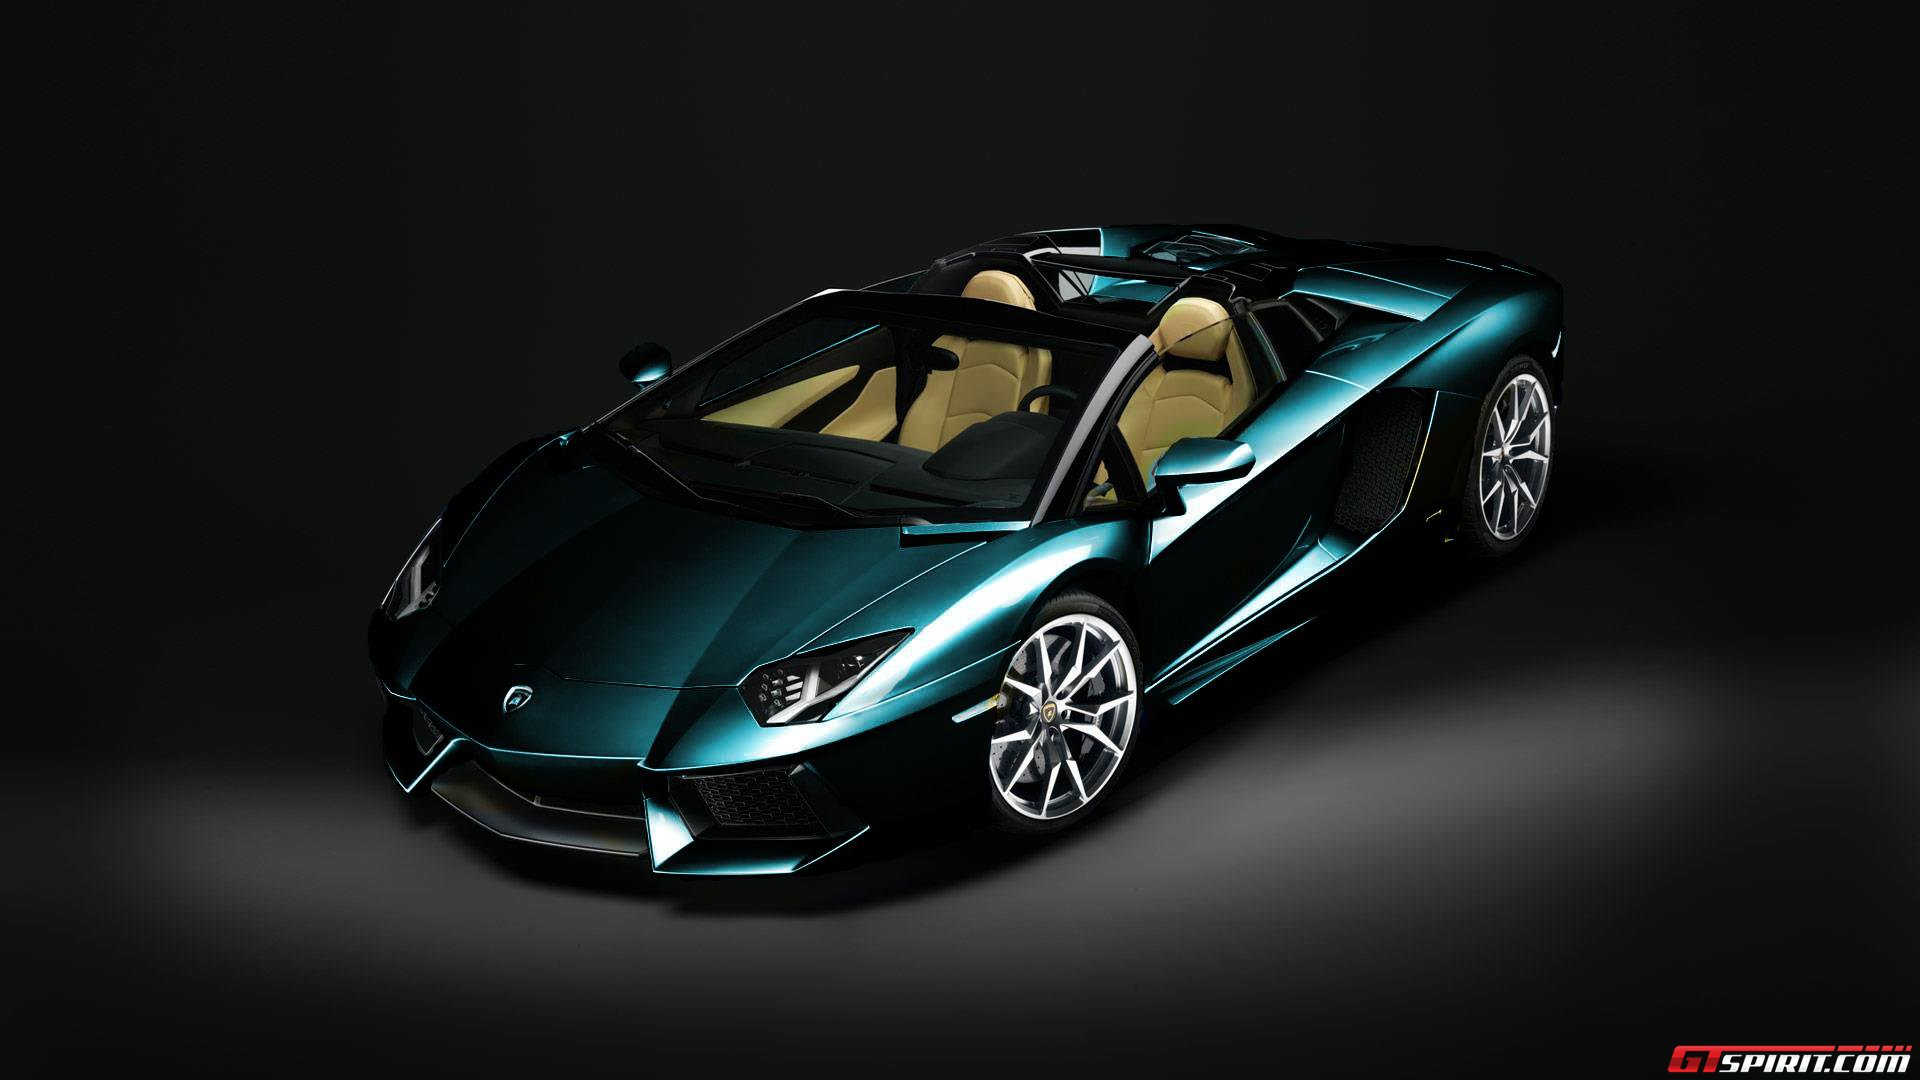 2013 Lamborghini Aventador Roadster Colors Photo 1